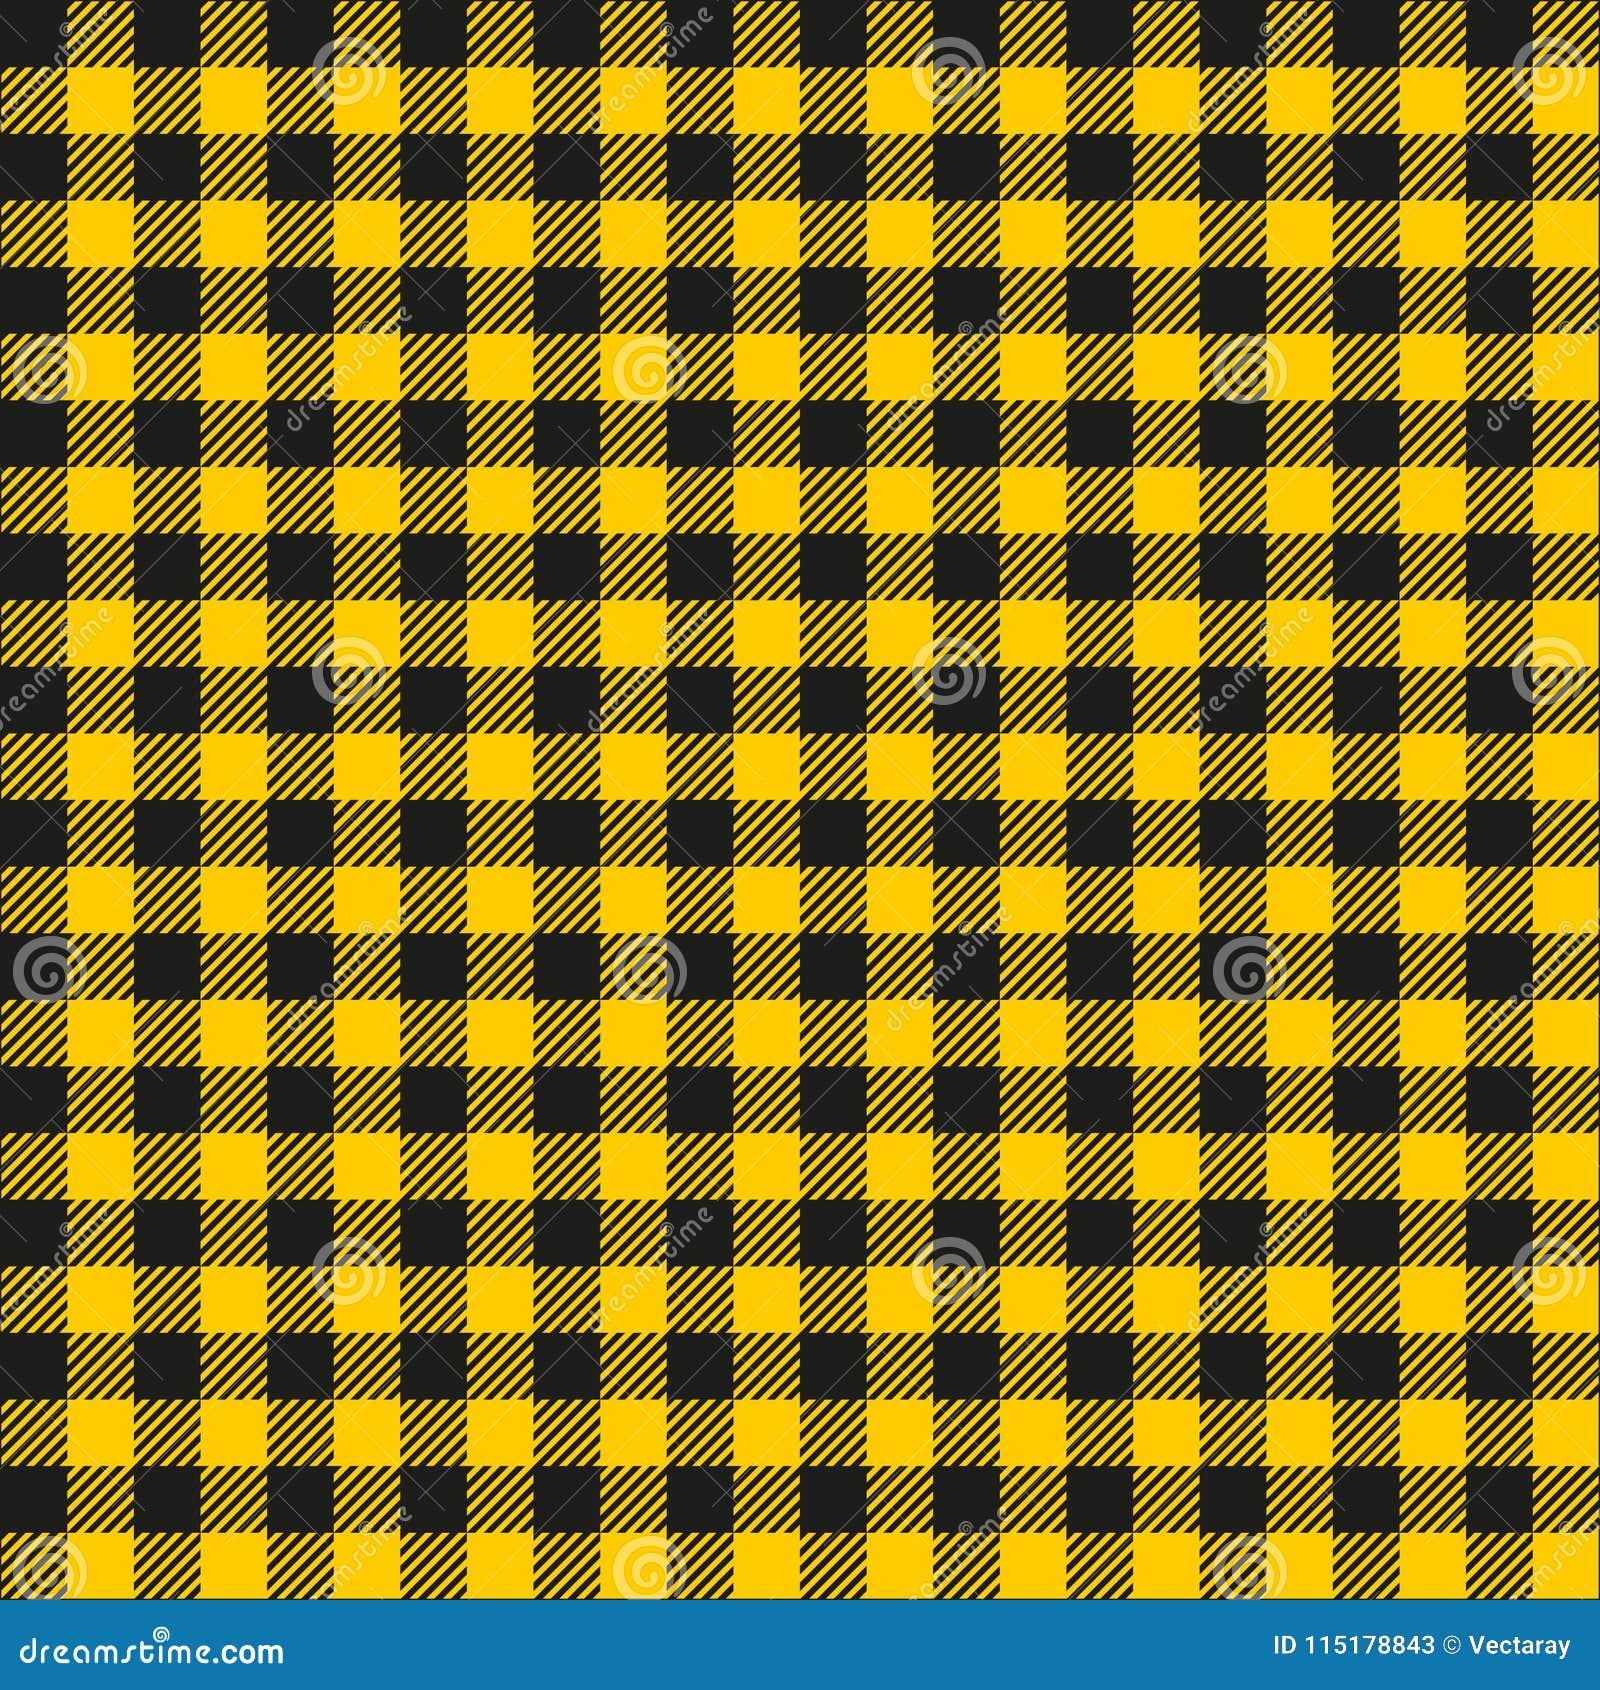 Seamless Mustard Yellow And Black Checkered Fabric Pattern